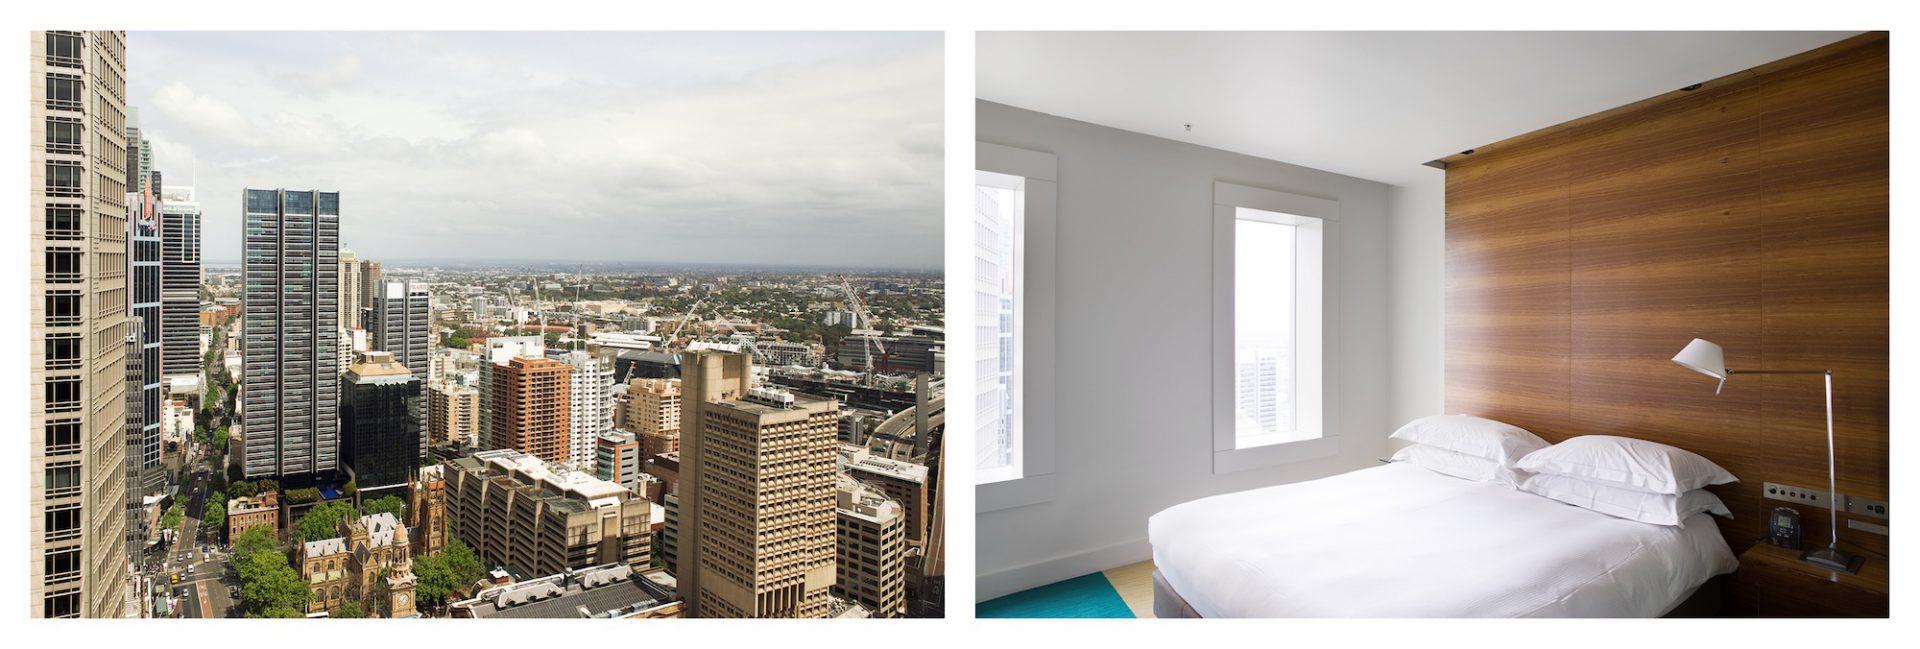 Seite 48–49.  08.10.2015, Sydney, Room 4320